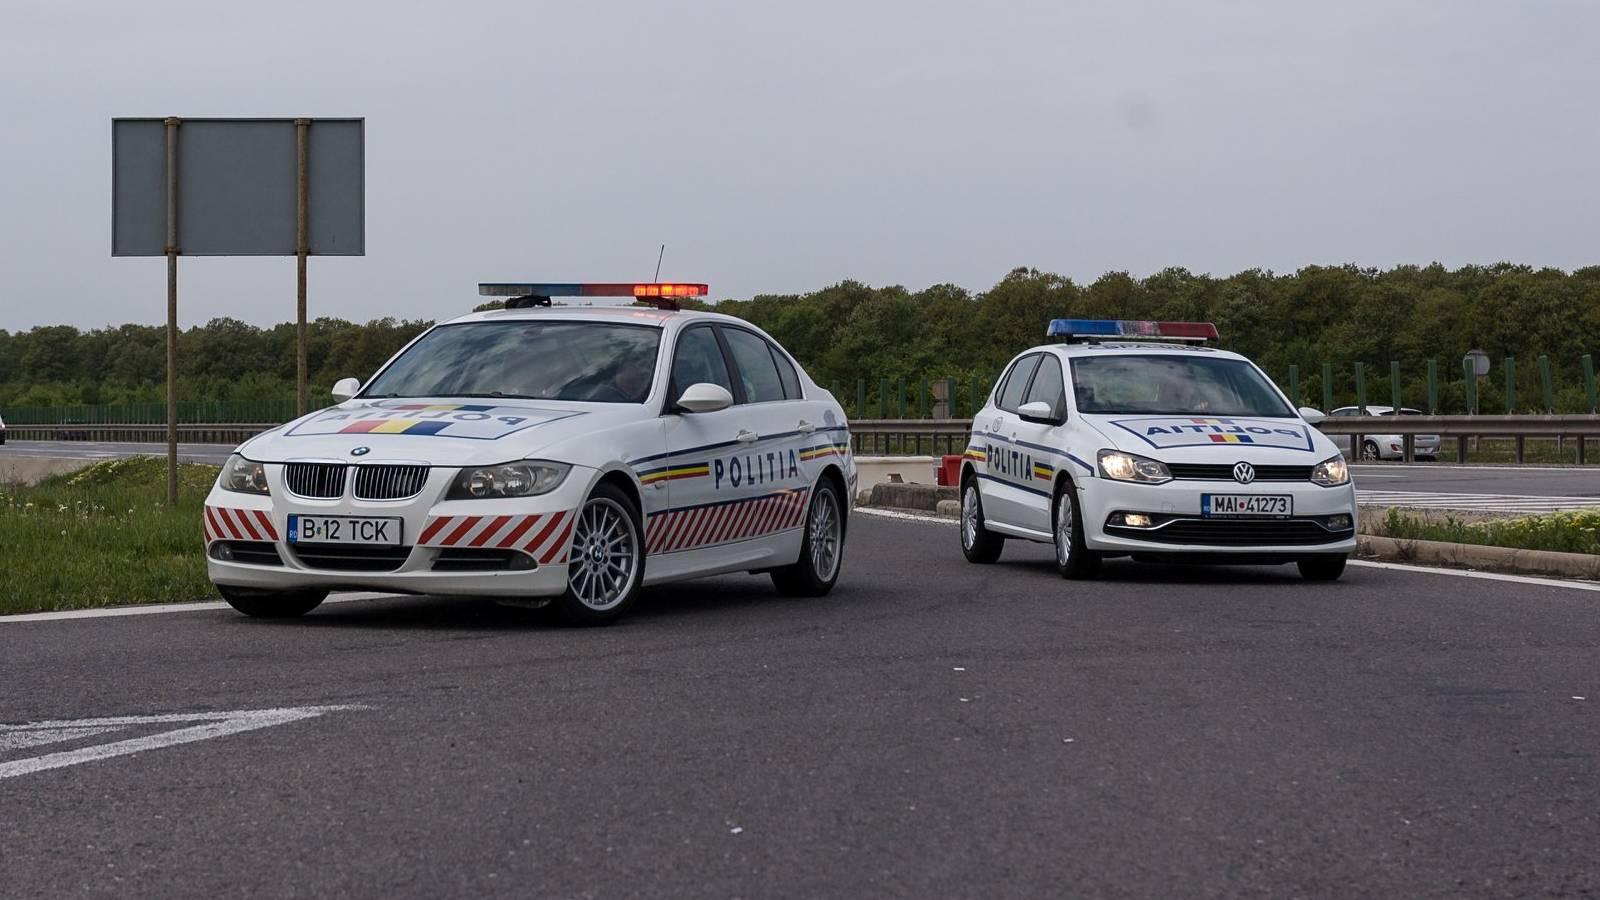 Politia Romana Scade Numarul Amenzi Aplicate Cauza Coronavirus